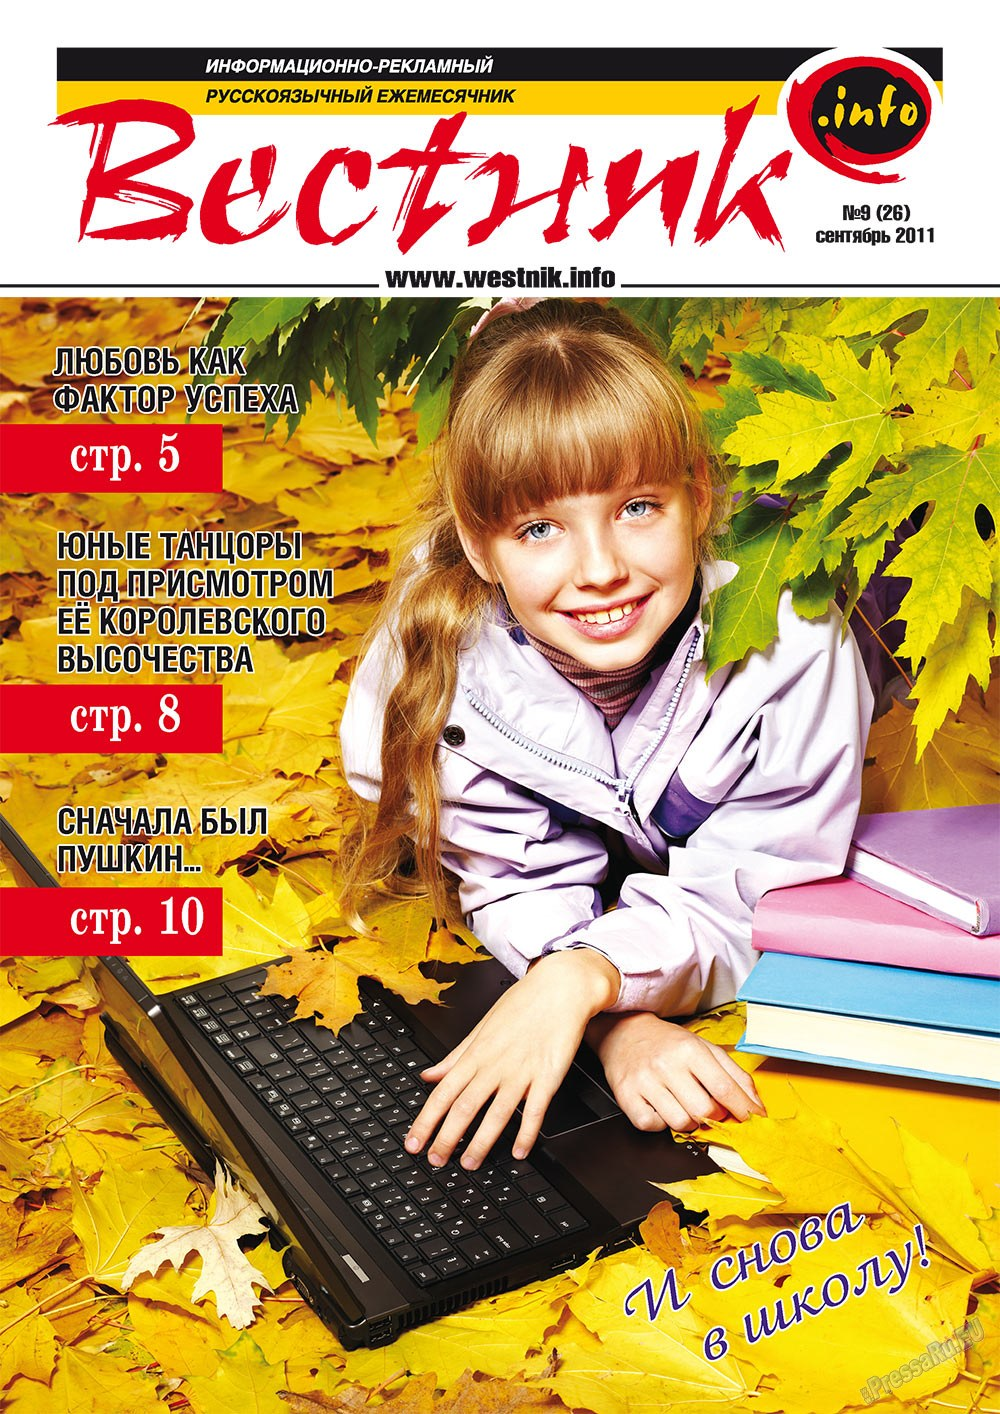 Вестник-info (журнал). 2011 год, номер 9, стр. 1